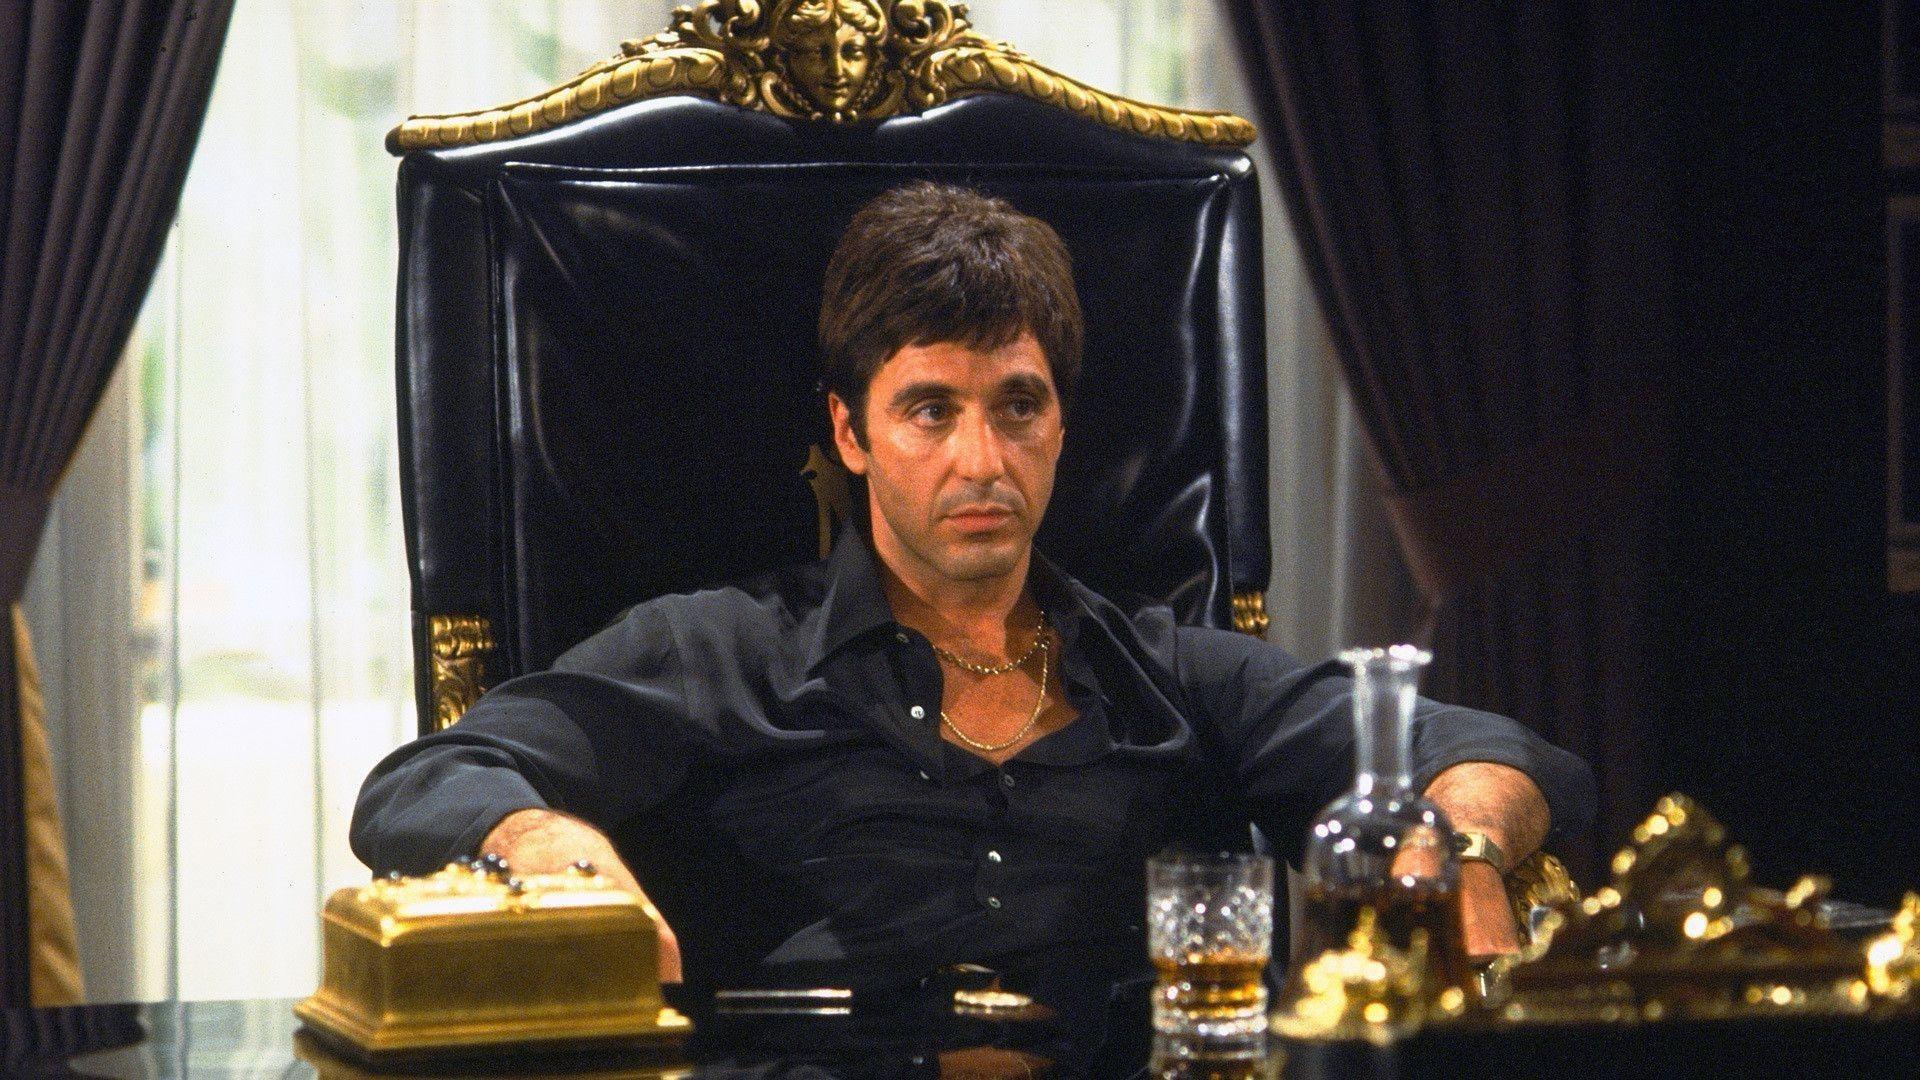 76420 Https Hdwallpapersmafia Com 76420 Al Pacino High Res Wallpaper Tony Montana Desktop Wallpaper Tony Montana H Scarface Movie Al Pacino Scarface